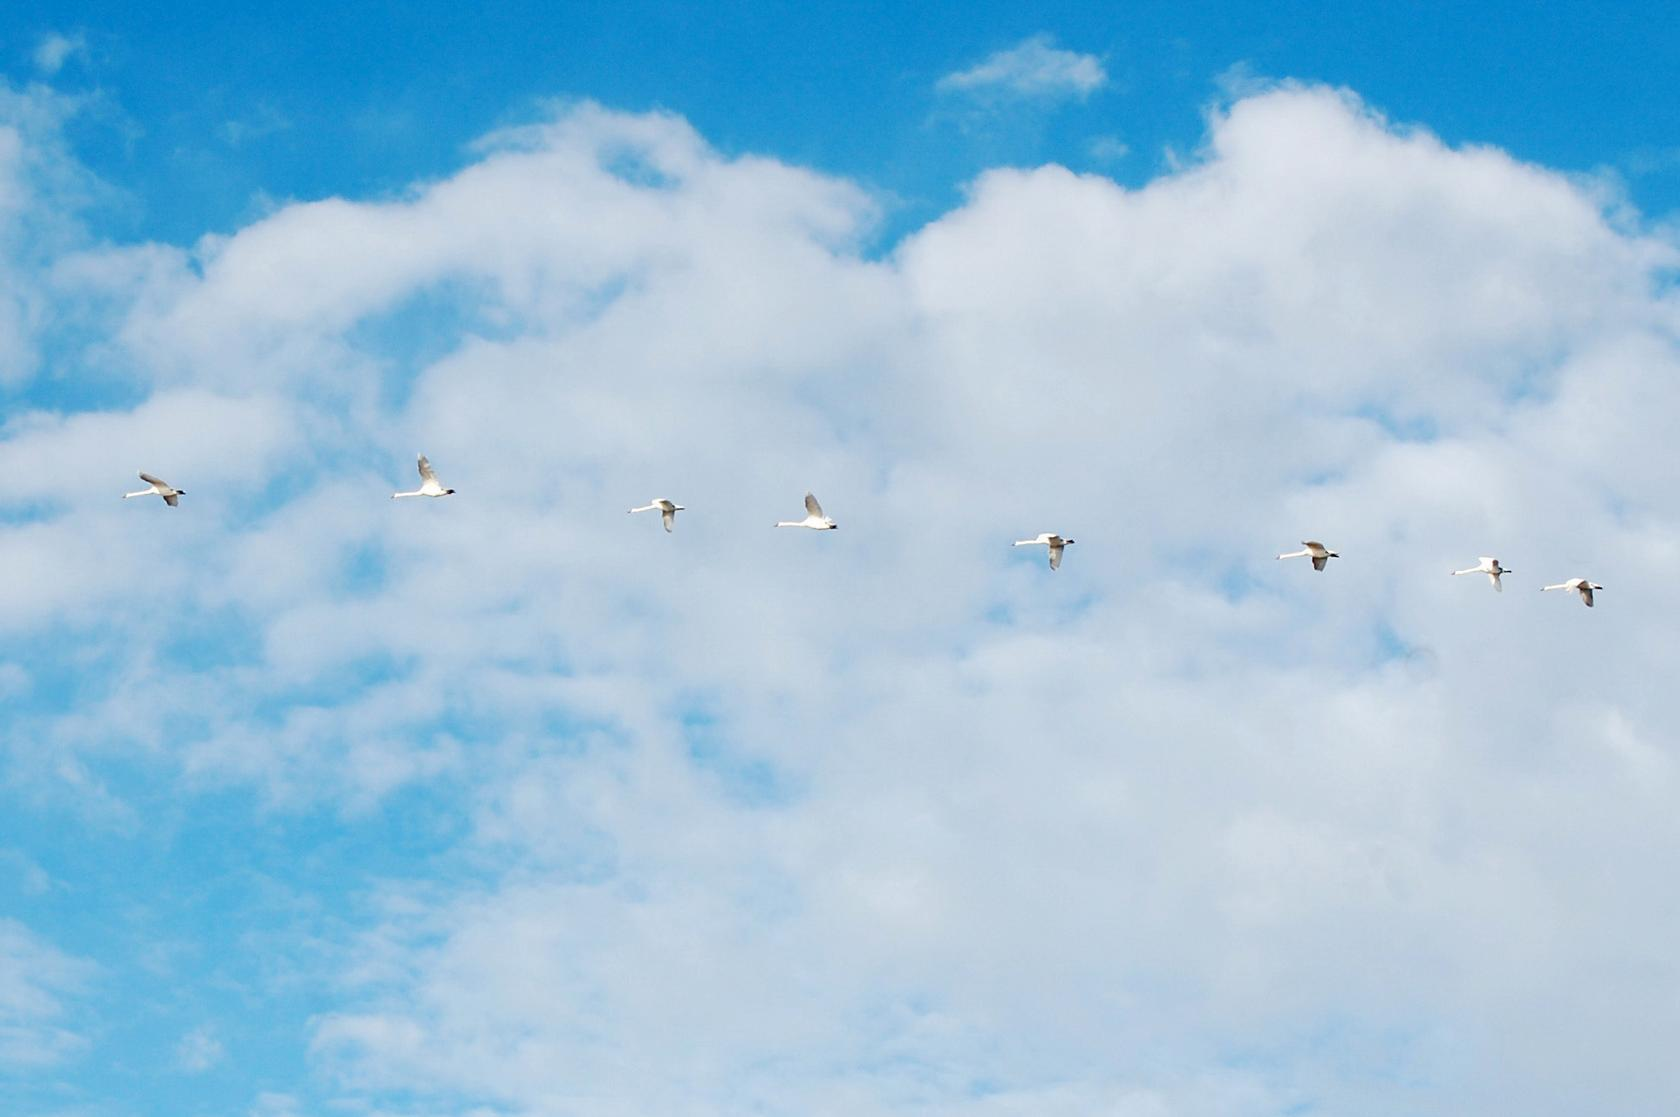 Картинки, картинки журавлей в небе